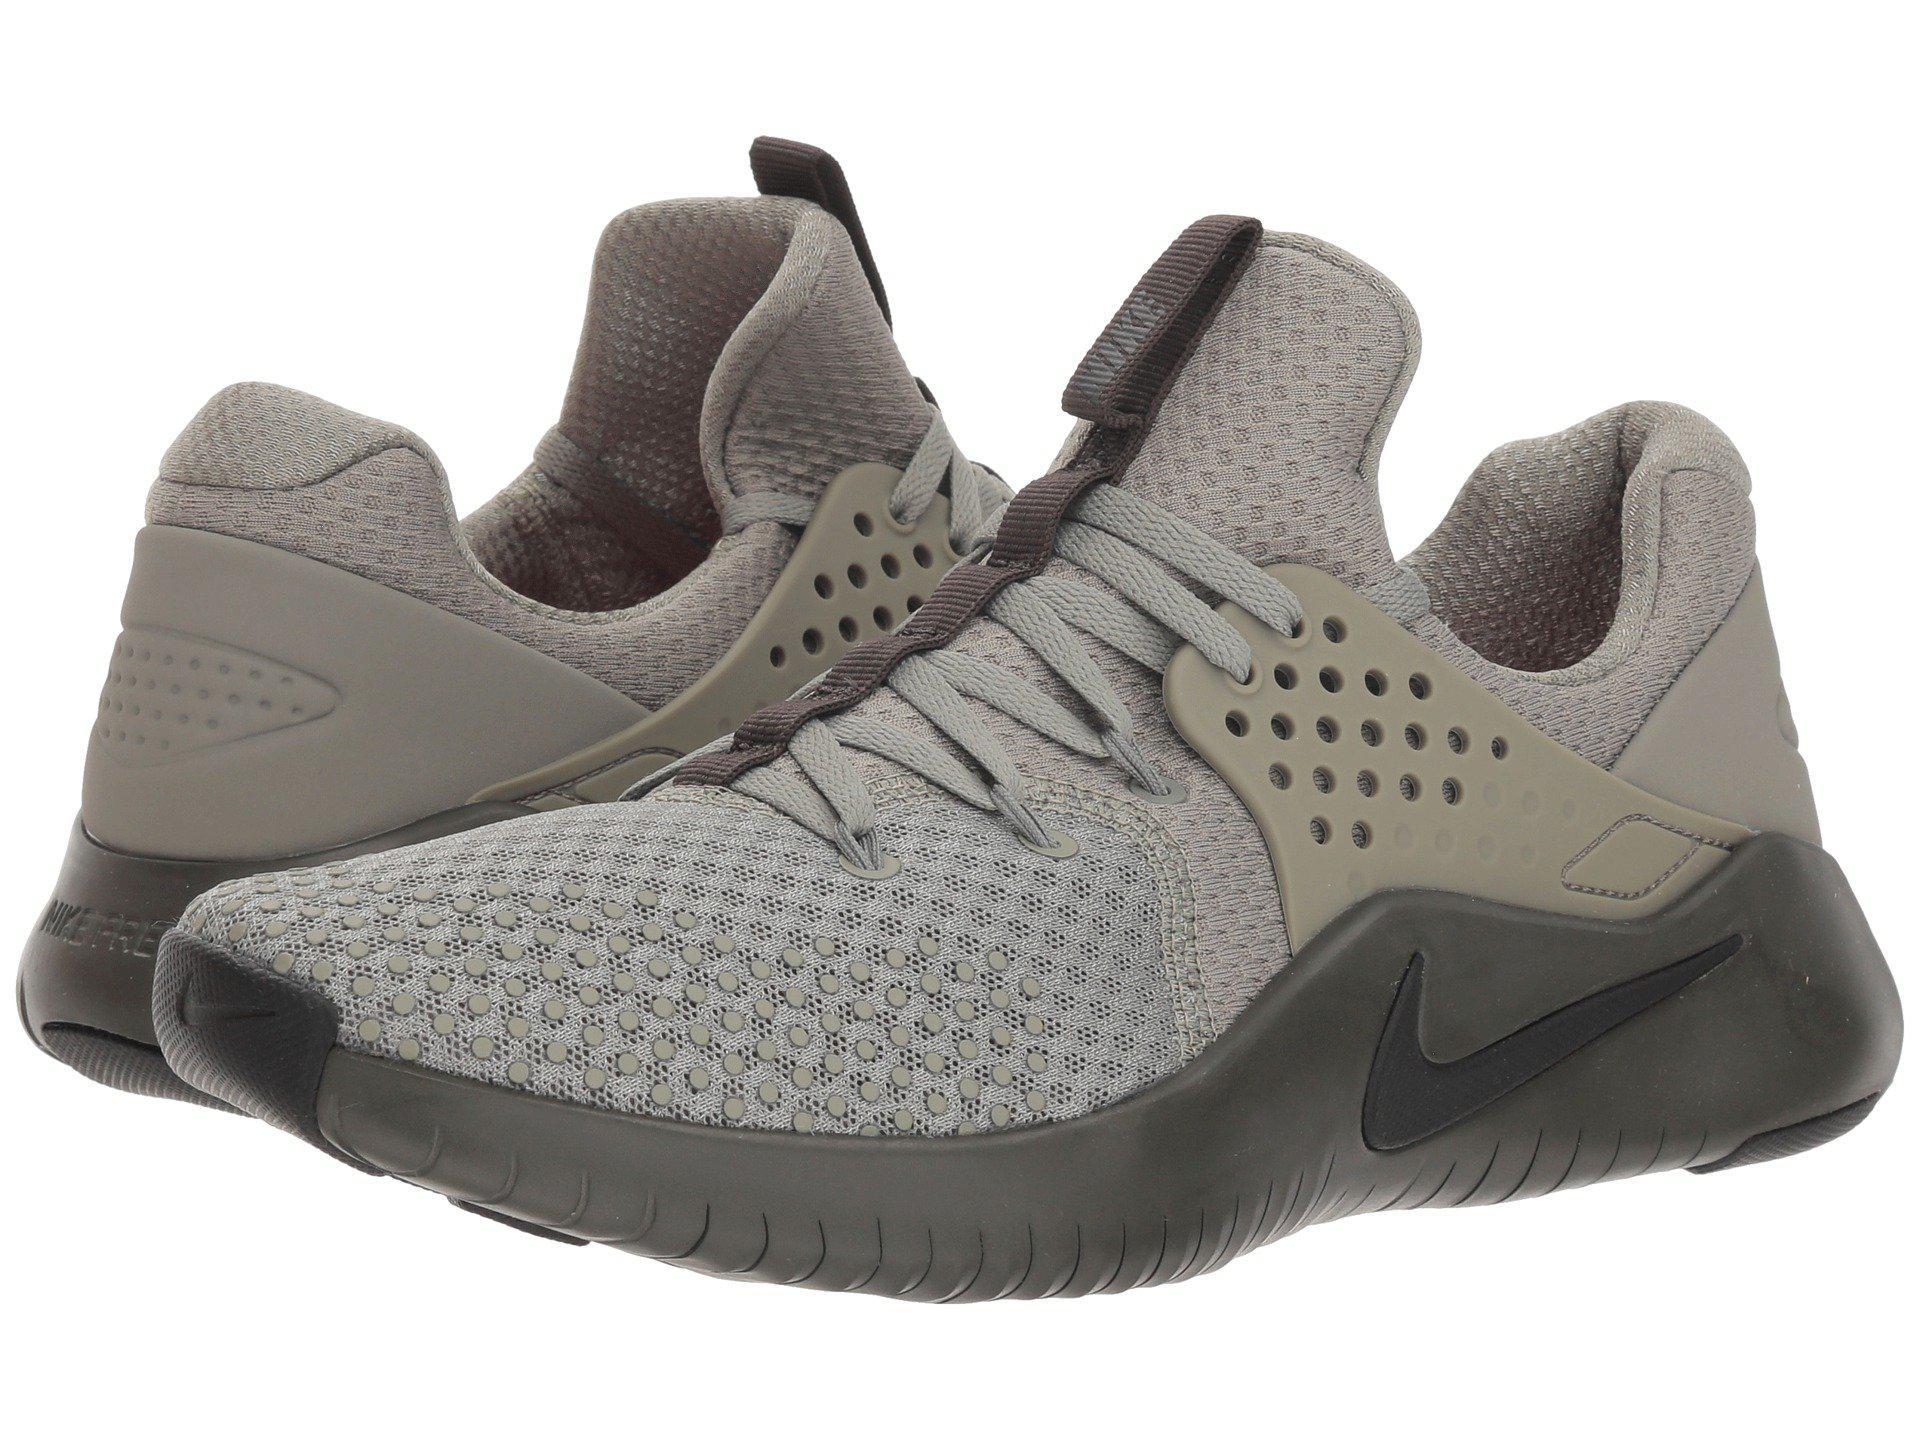 a7849d4d8512 Nike. Free Trainer V8 (matte Silver black white) Men s Cross Training Shoes